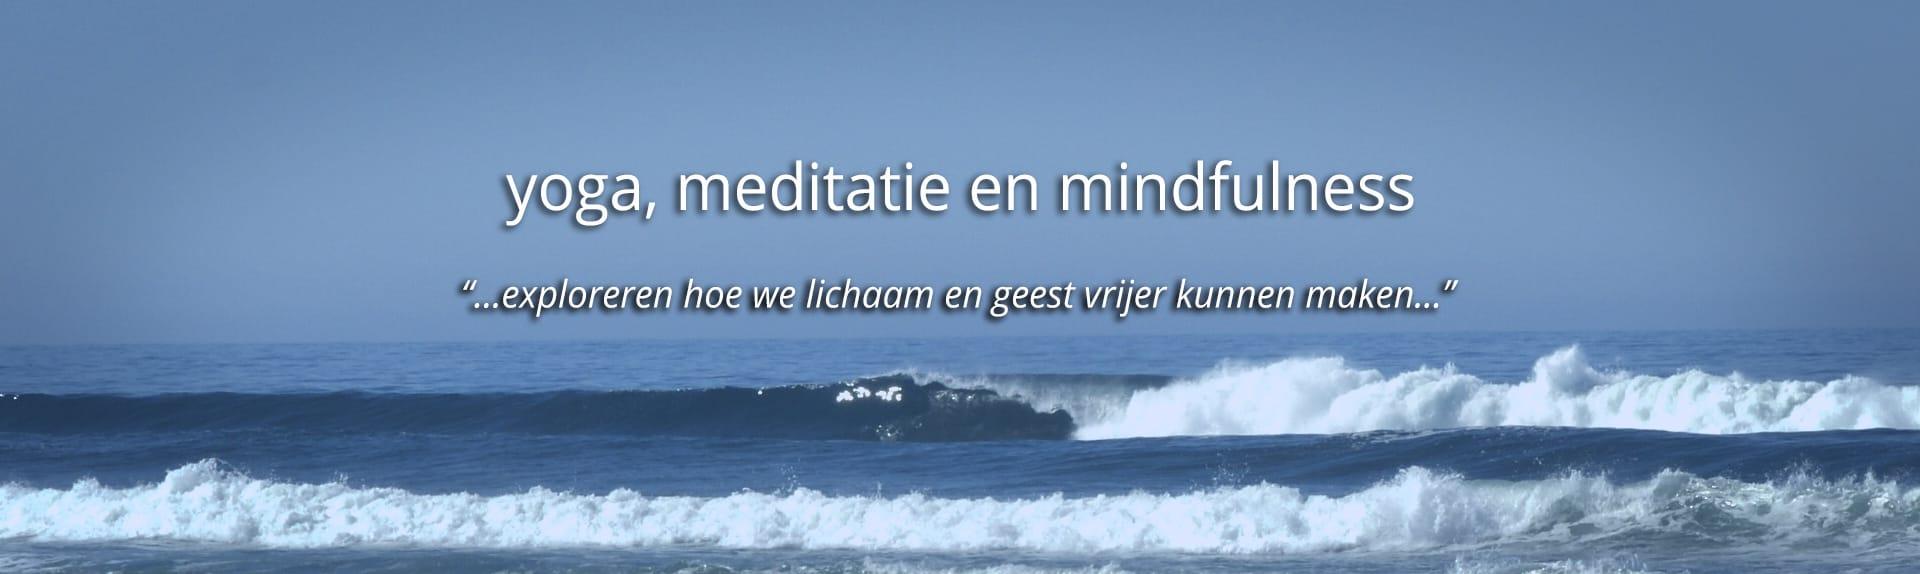 yoga meditatie en mindfulness